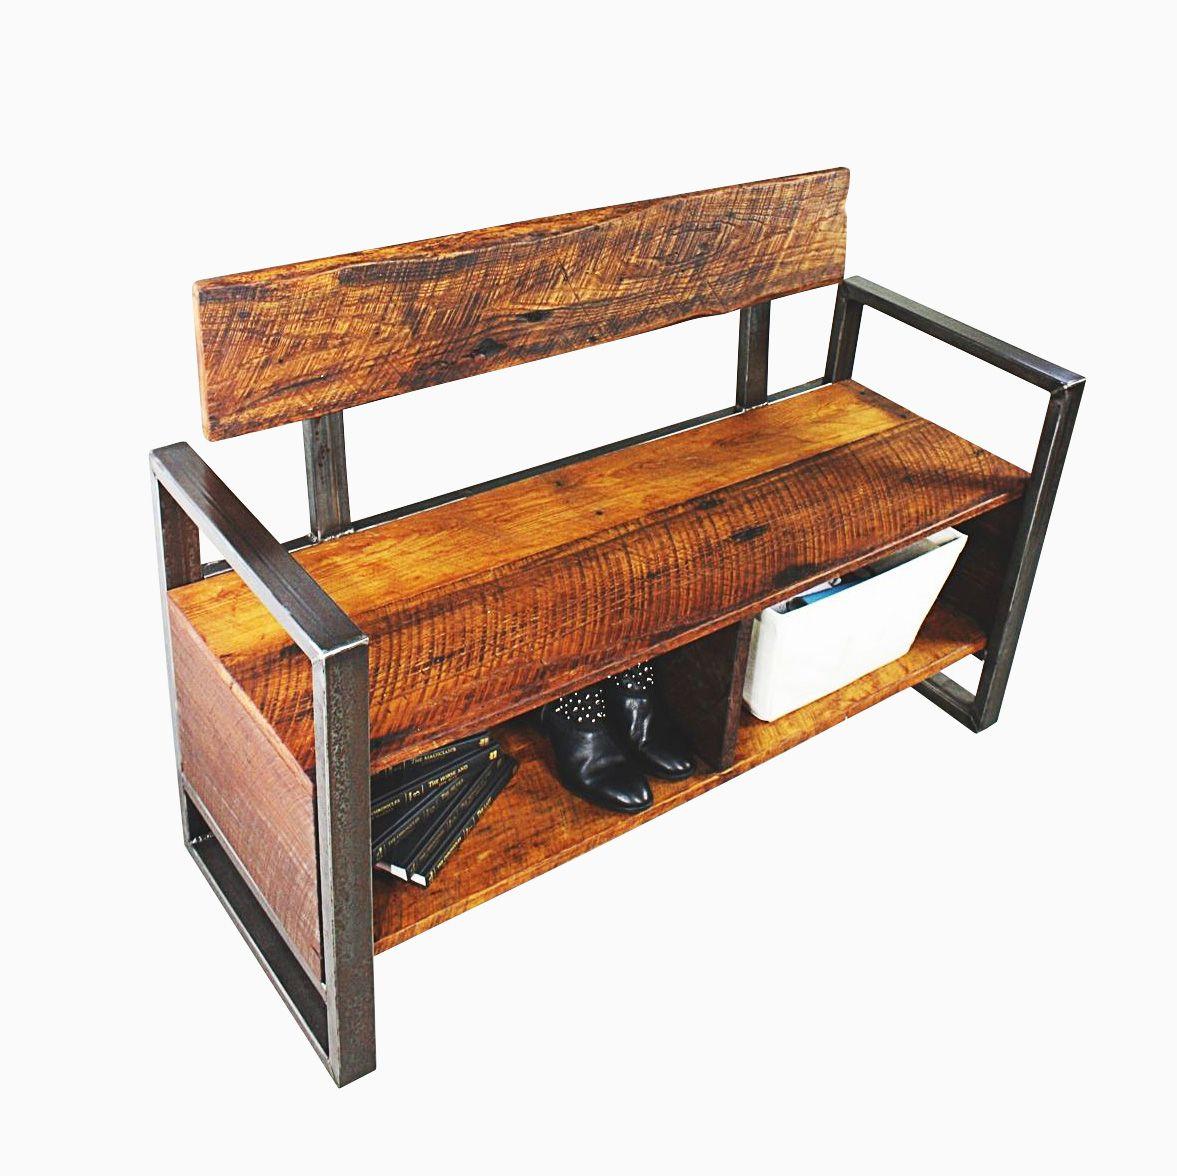 Furniture Unique: Buy A Custom Unique Reclaimed Wood Storage Foyer Bench